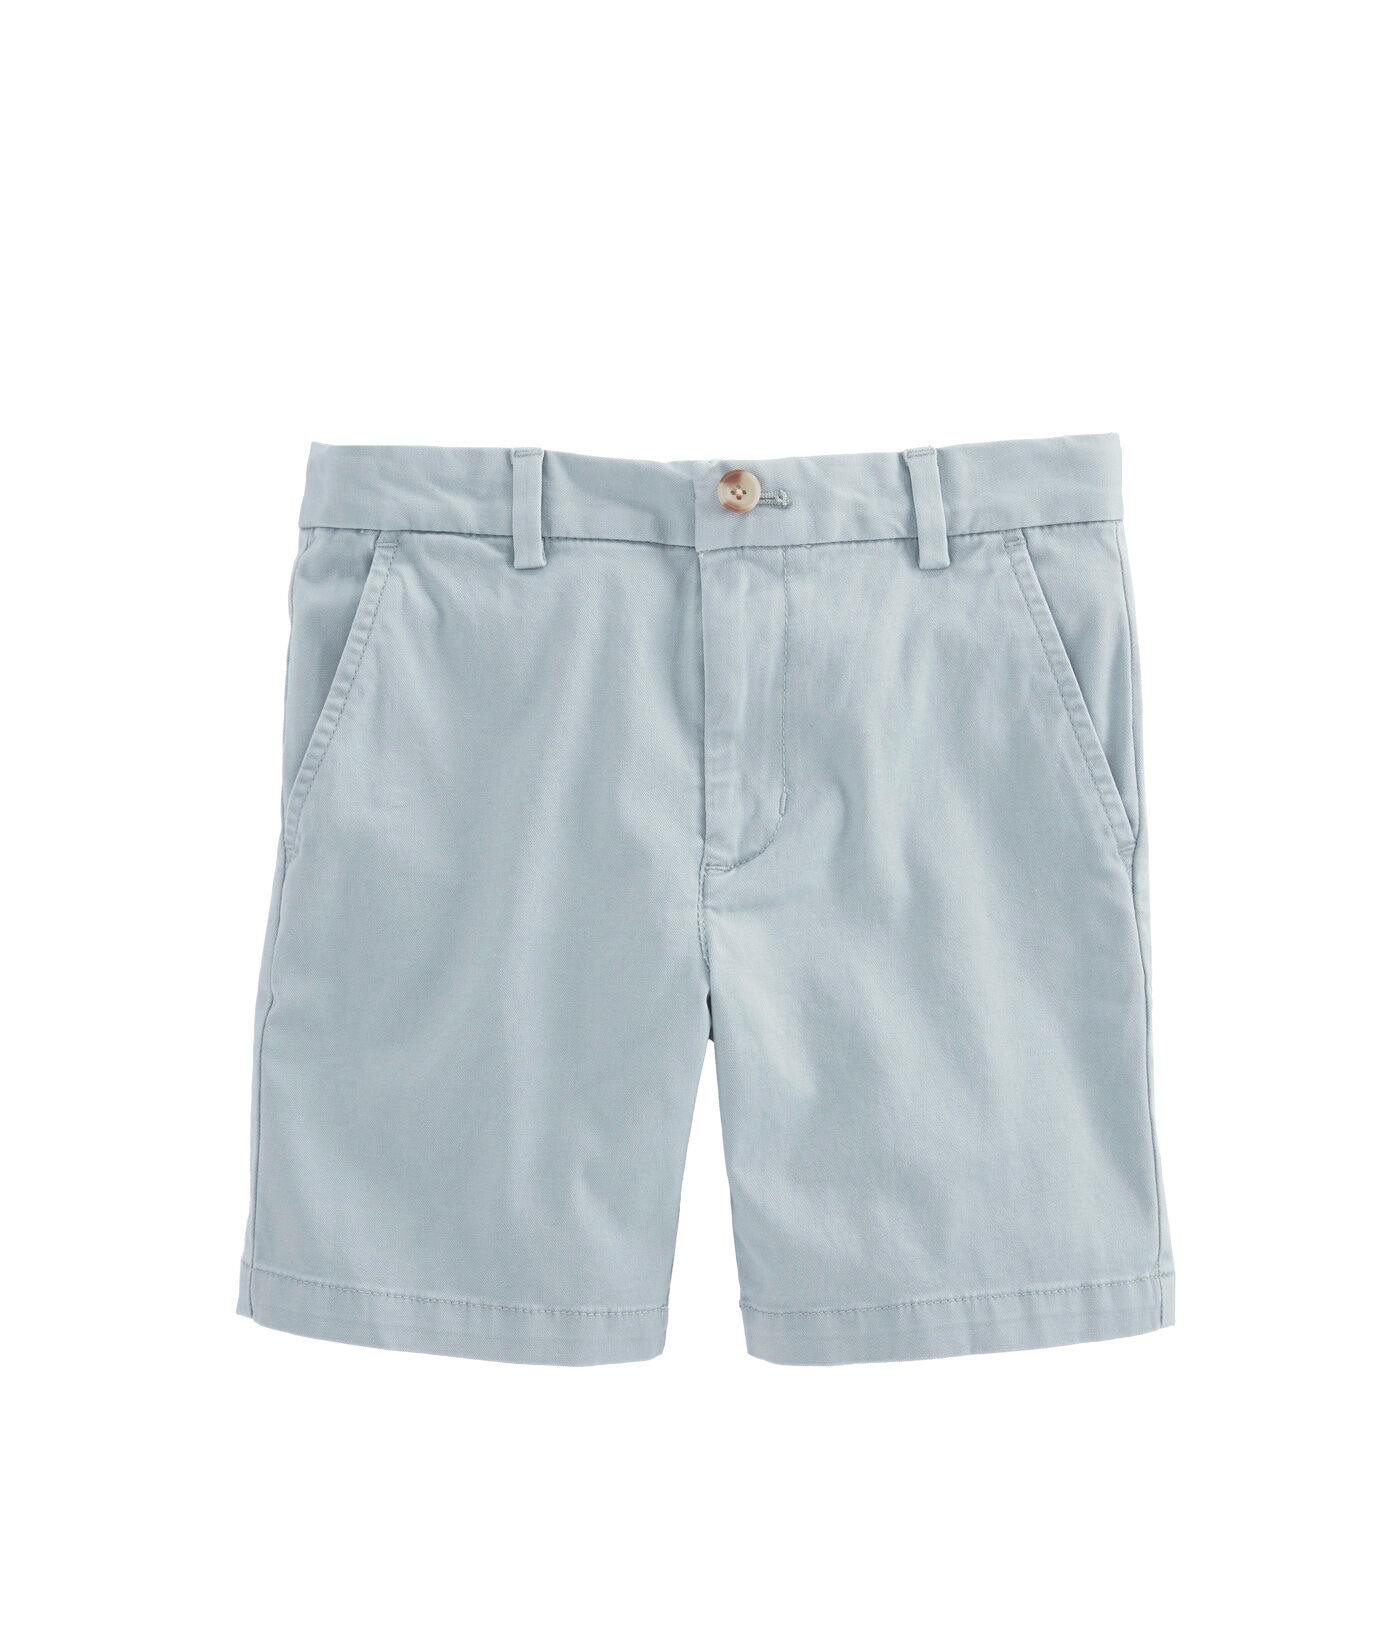 Boys stretch breaker shorts also  and pants at vineyard vines rh vineyardvines